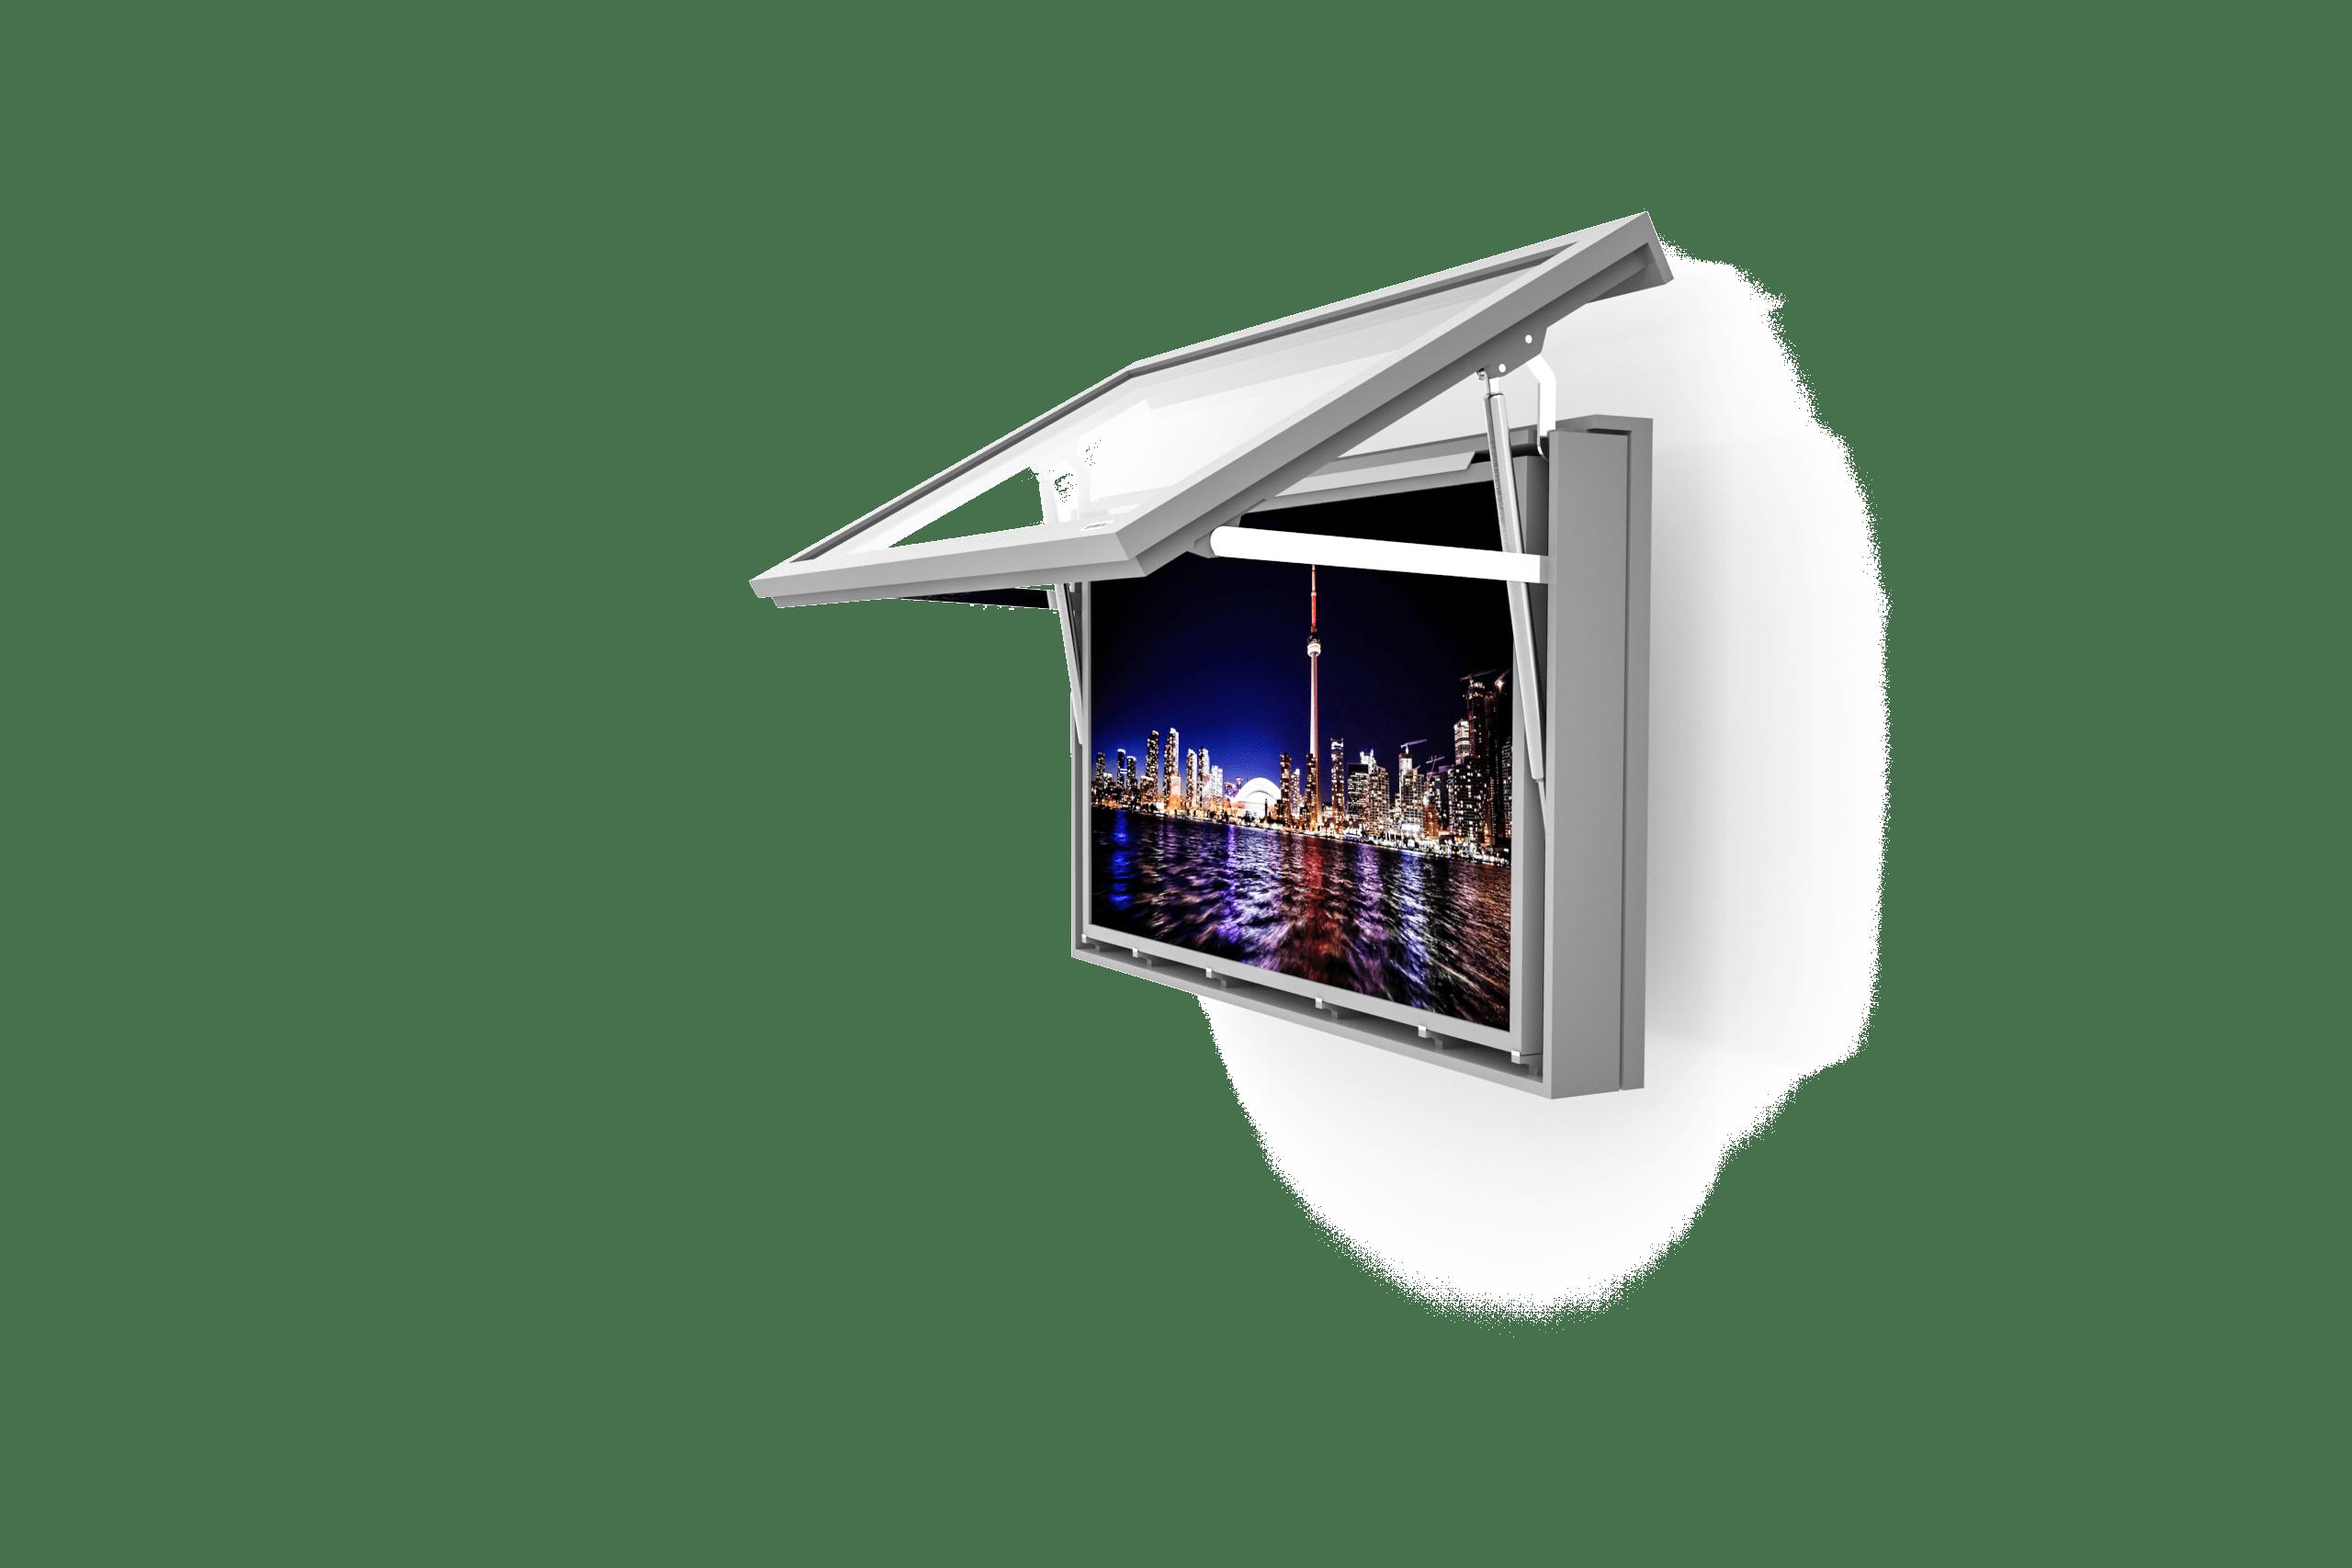 Monitoreinhausung_Wand_grau_offen